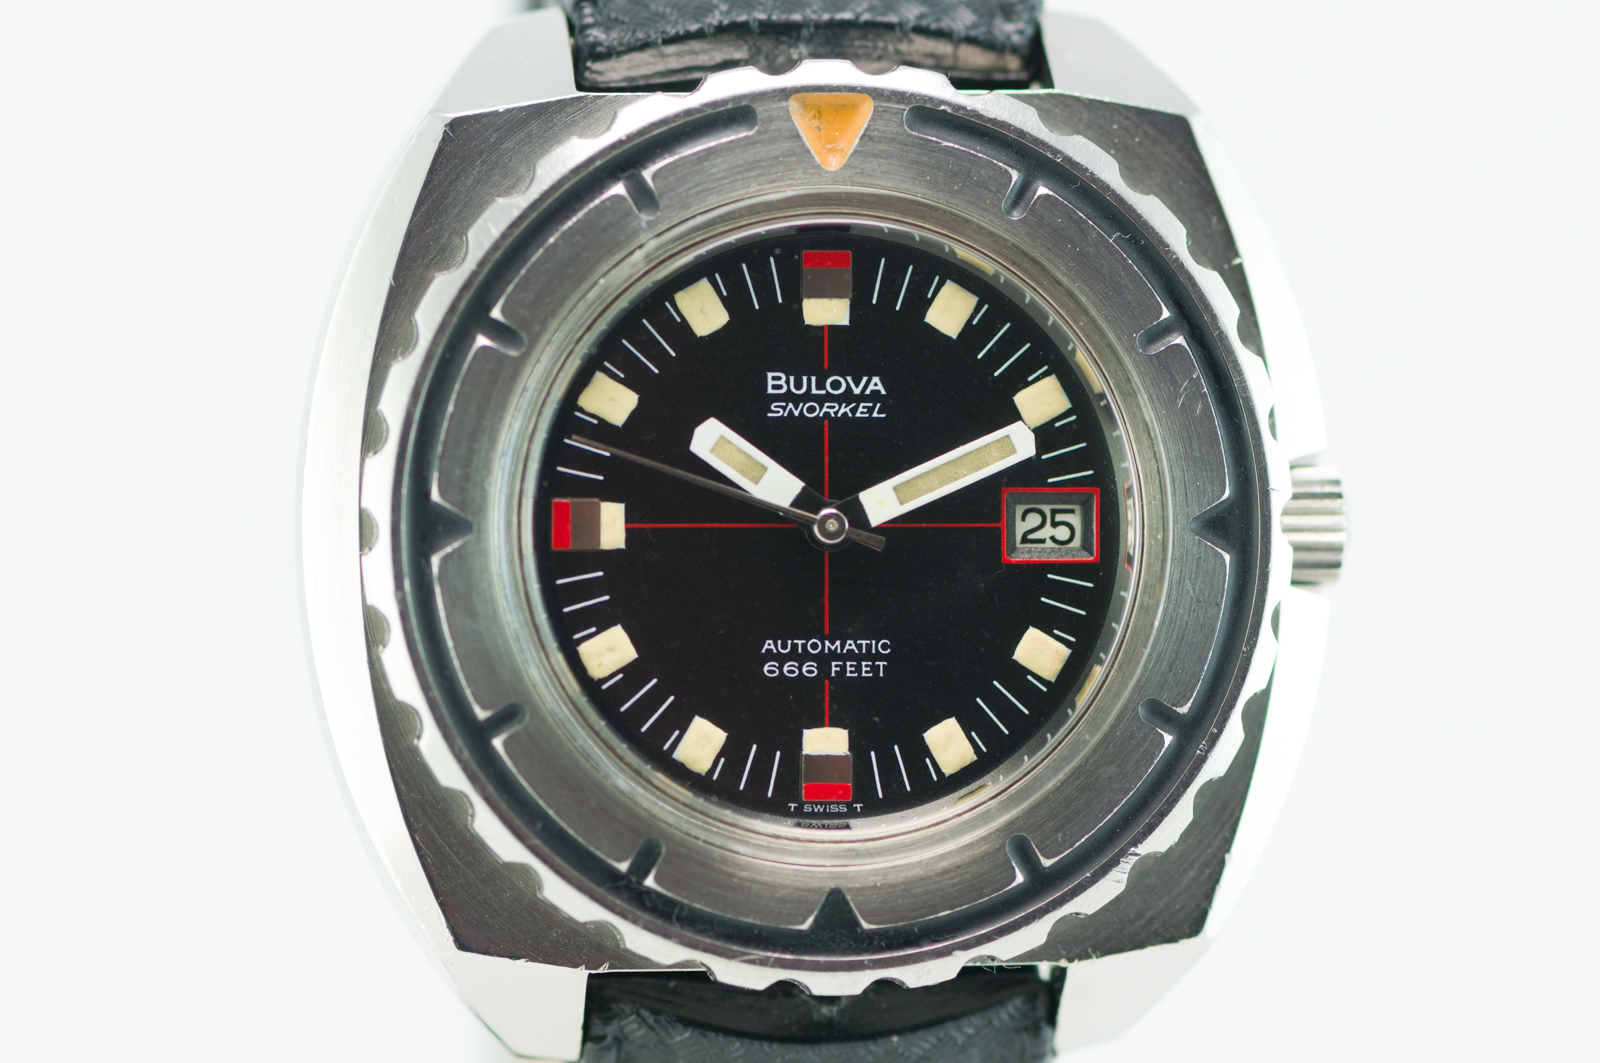 Bulova Snorkel Diver 666-7